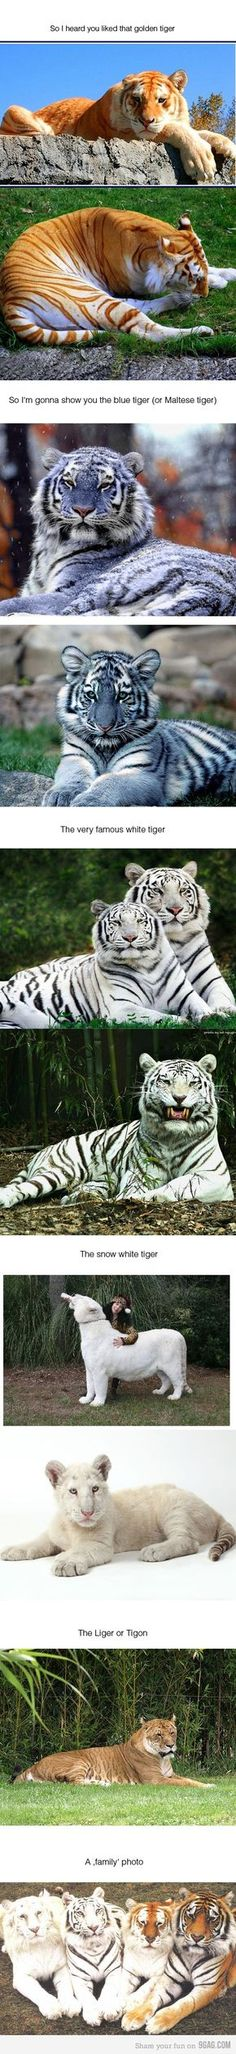 Blue Tiger, Snow white tiger, golden tiger, so cool